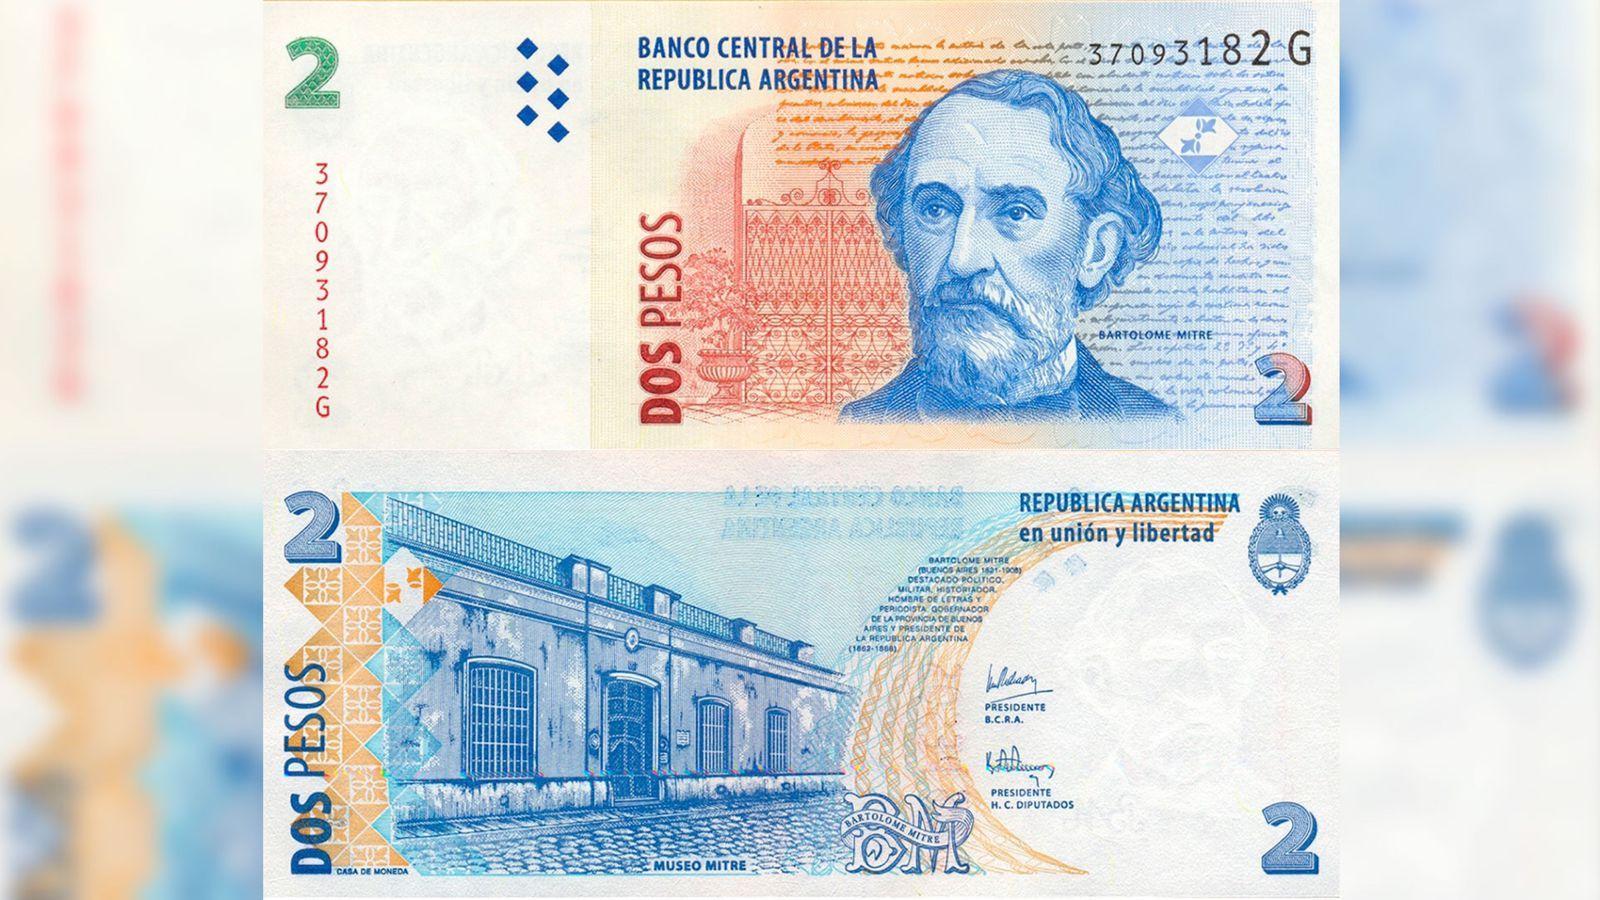 ¡ultimas semanas! subastan billetes de 2 pesos por mas de 8 mil